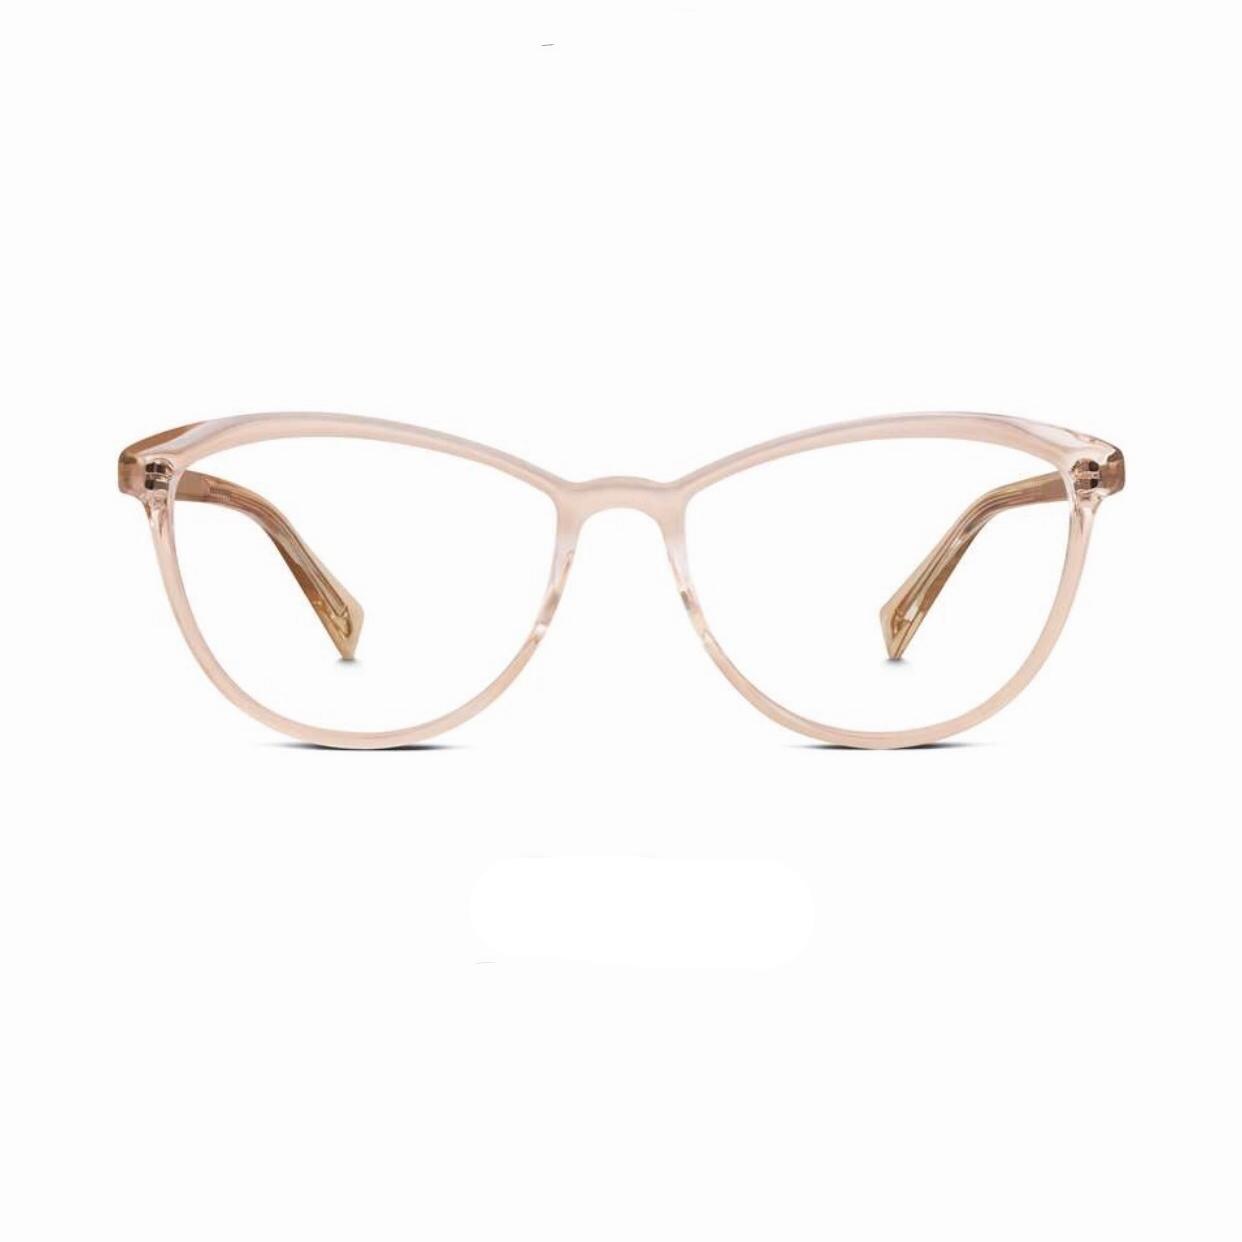 Warby Parker FramesJPG